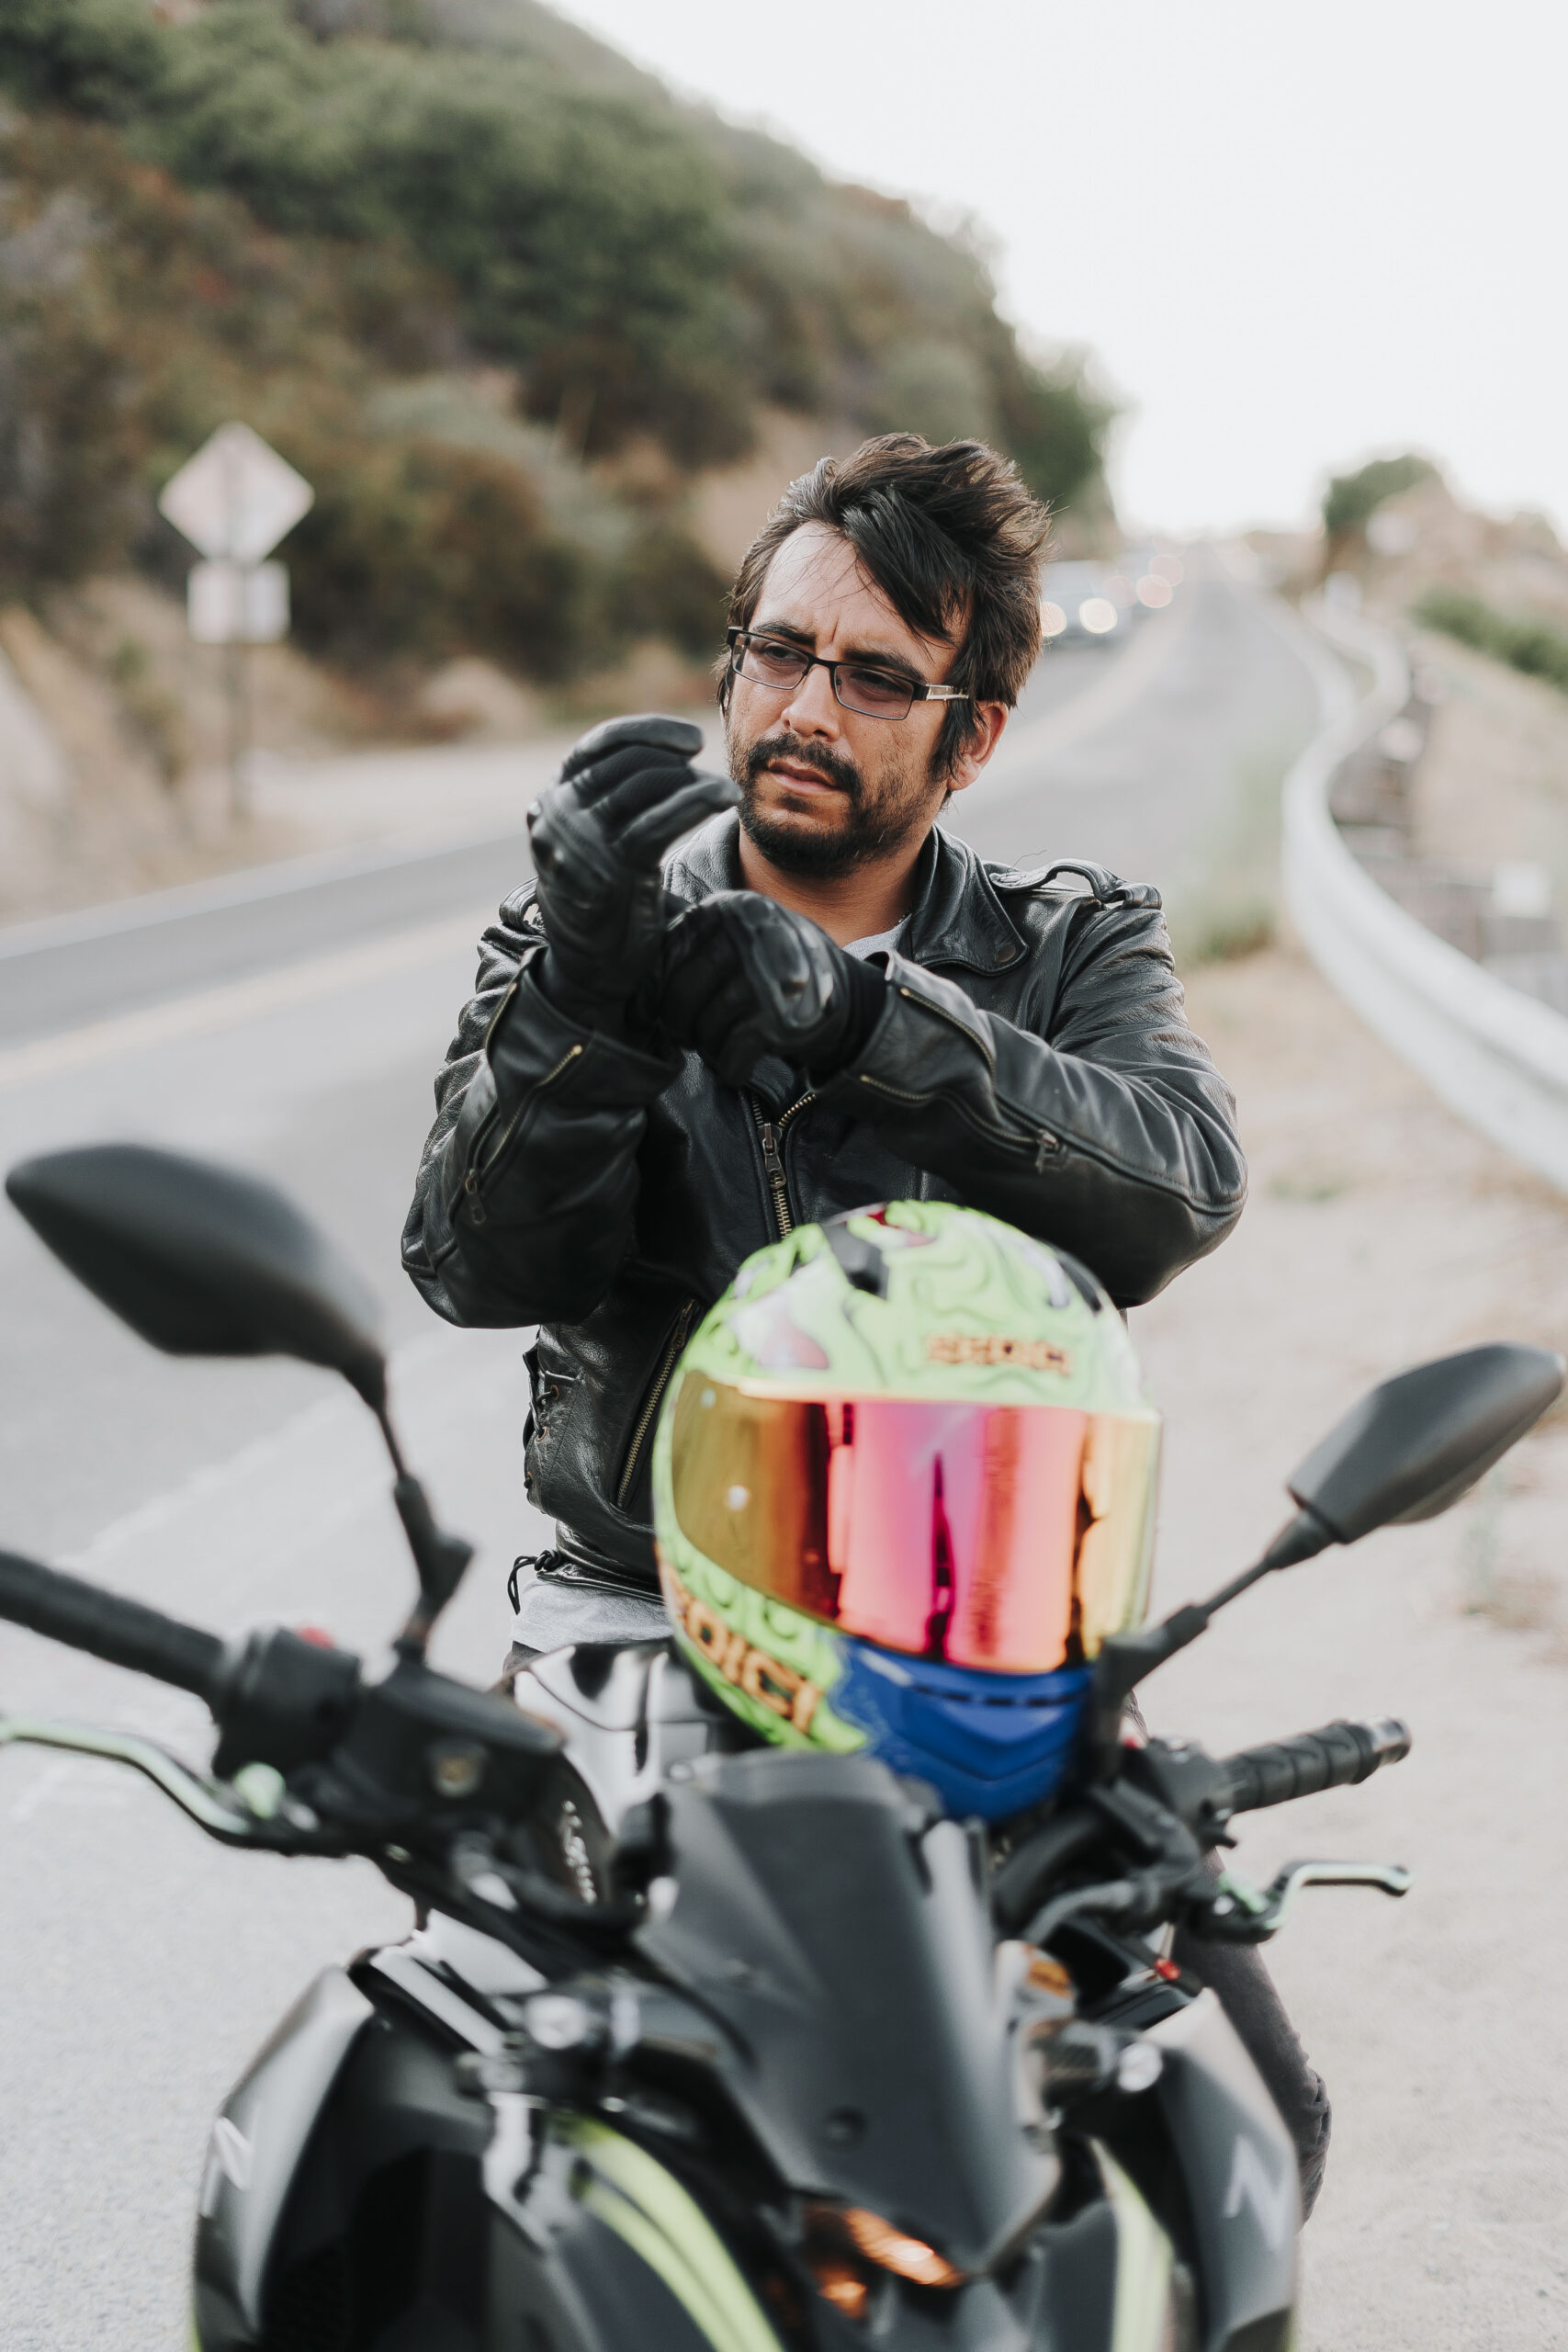 Featured Rider Sizqo Eunos